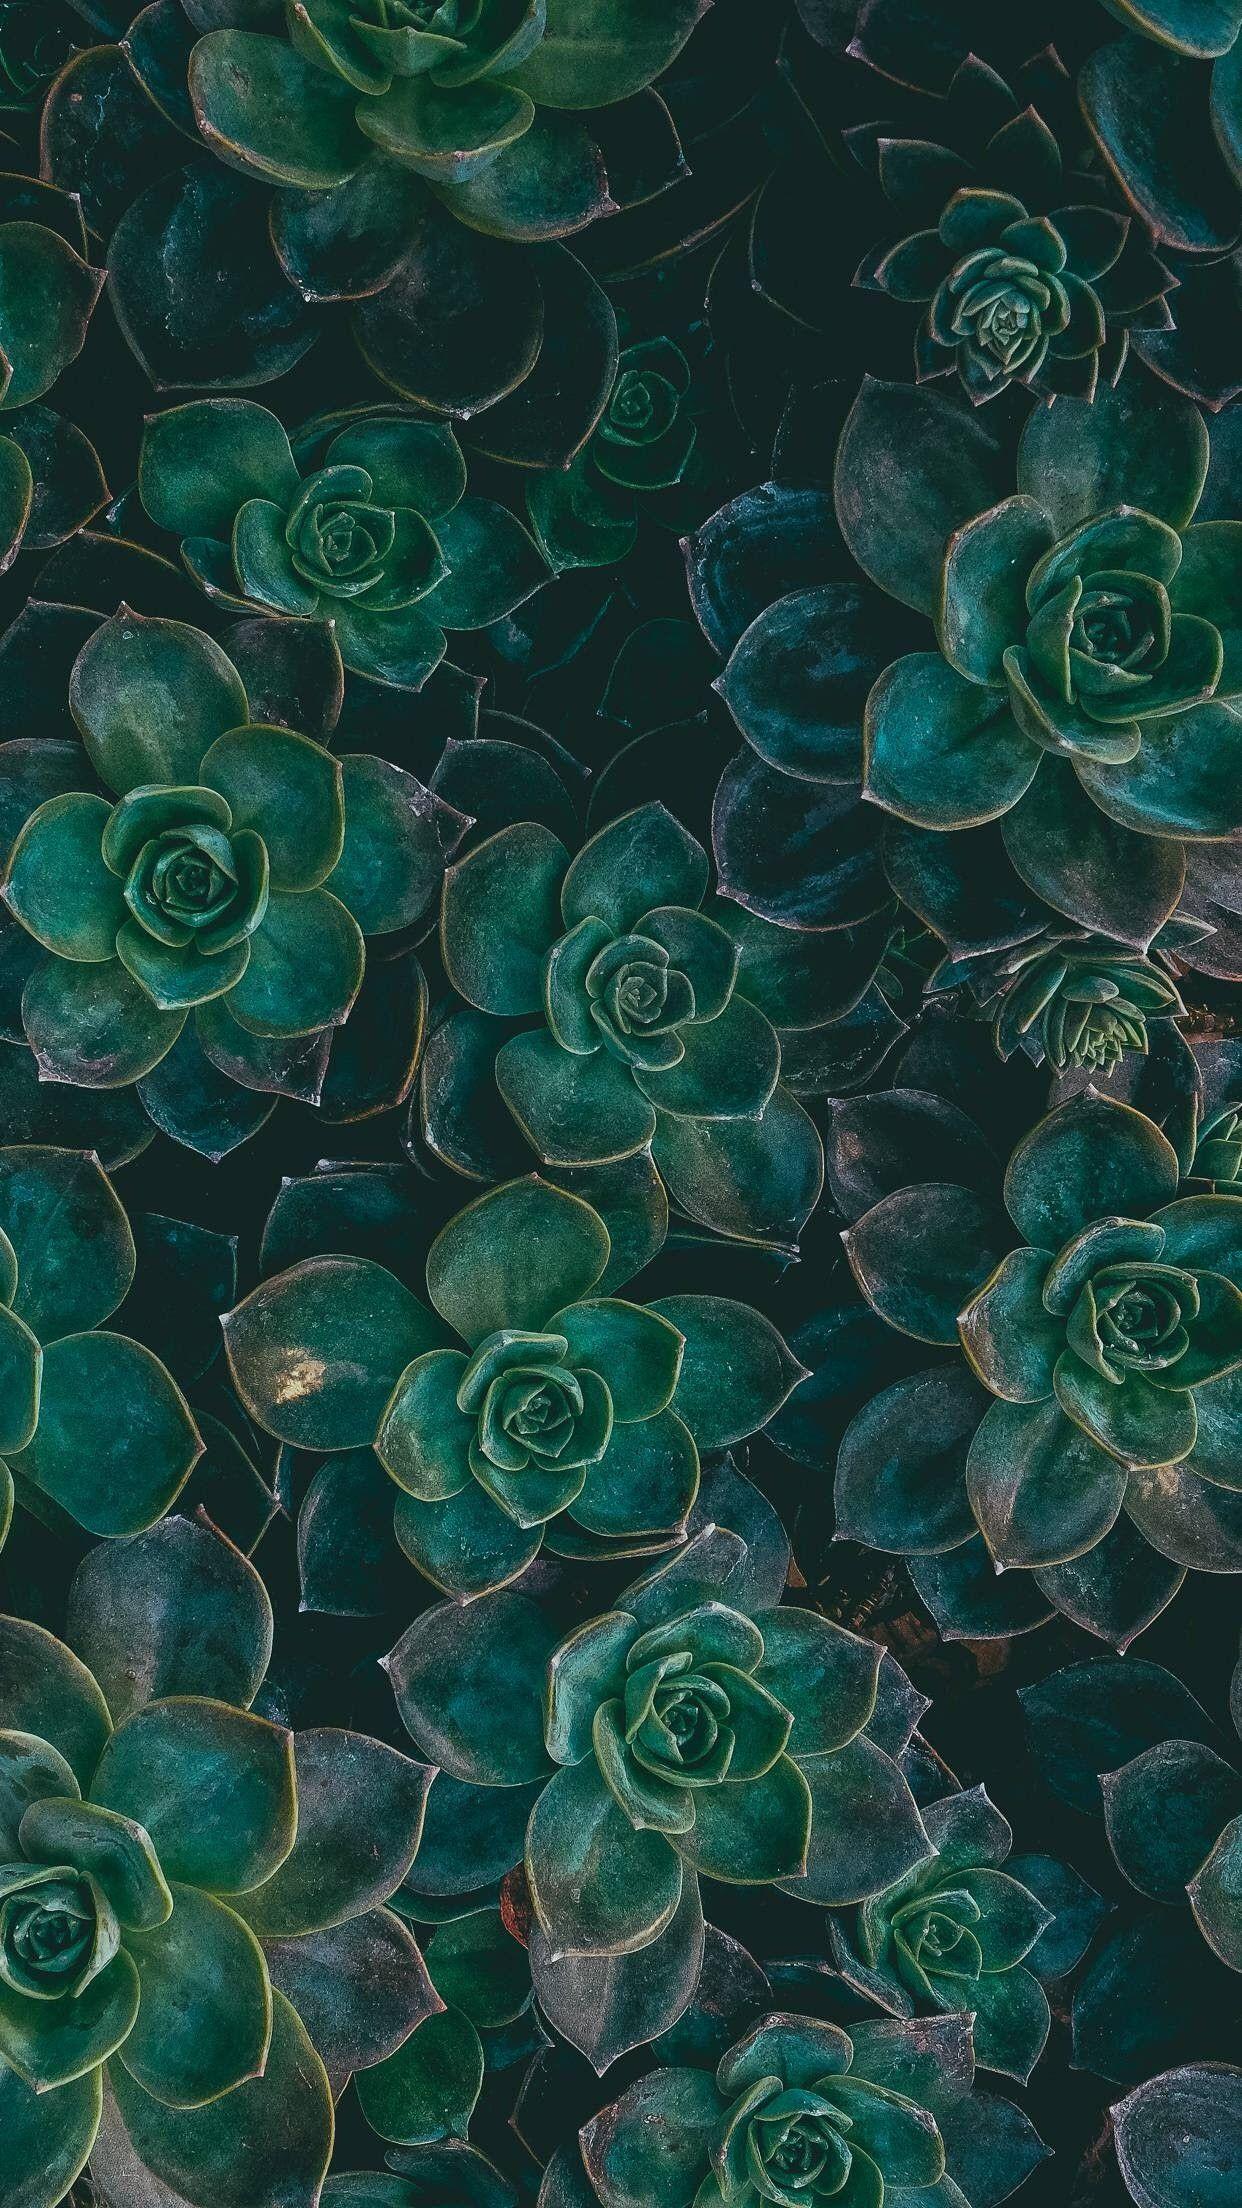 Iwallpapers Succulents Wallpaper Chevron Phone Wallpapers Nature Wallpaper